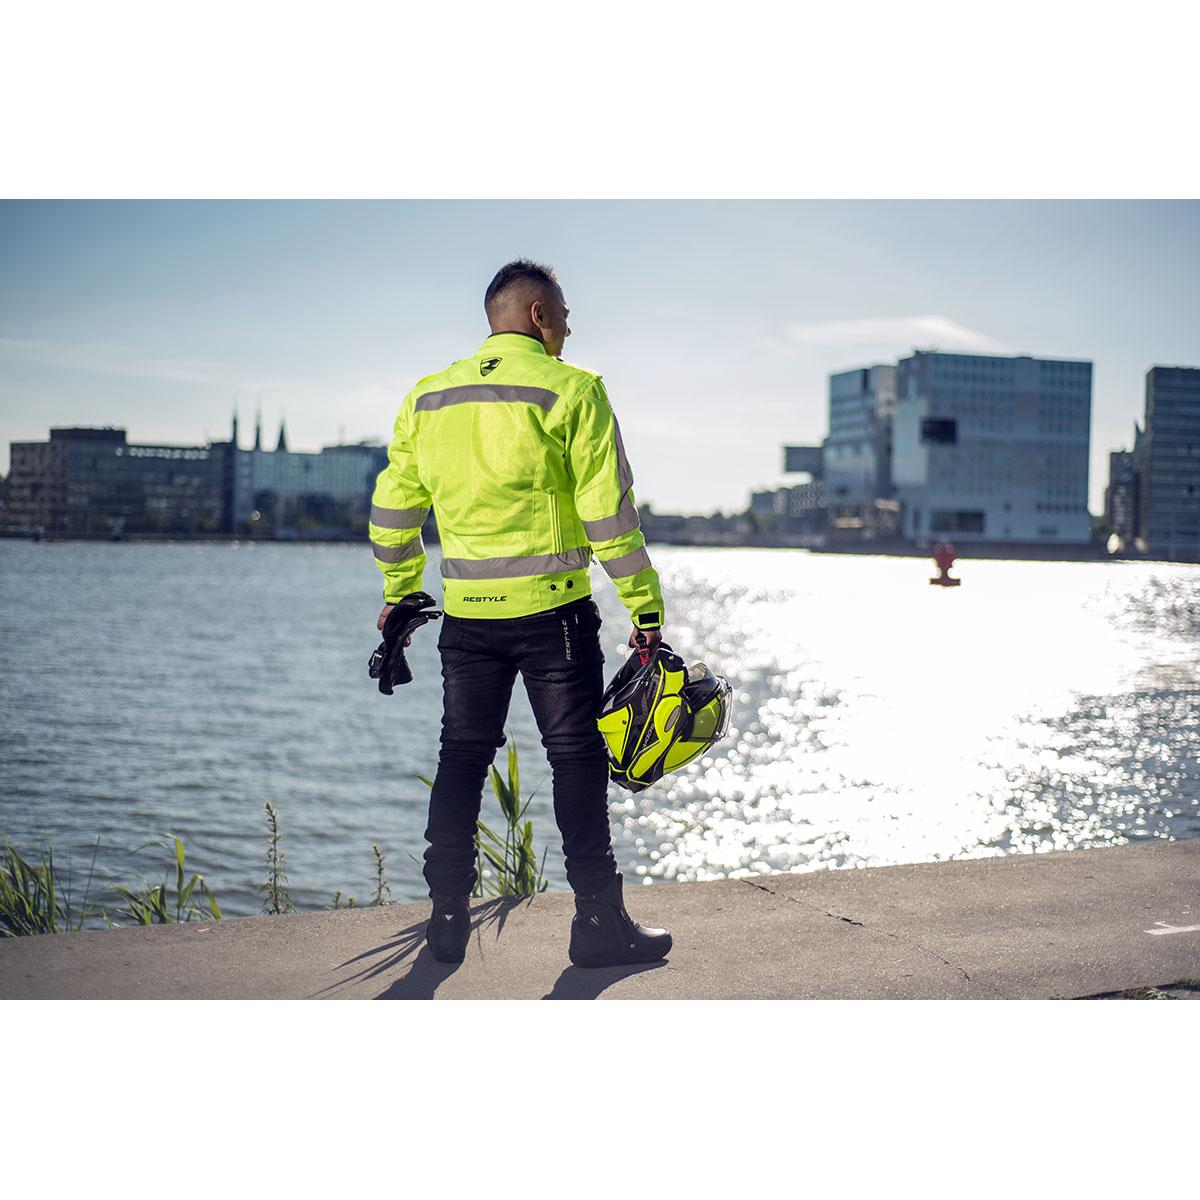 Summer Safety fluo jas i.c.m. Aviator Kevlar II broek incl CE-Level II protectie